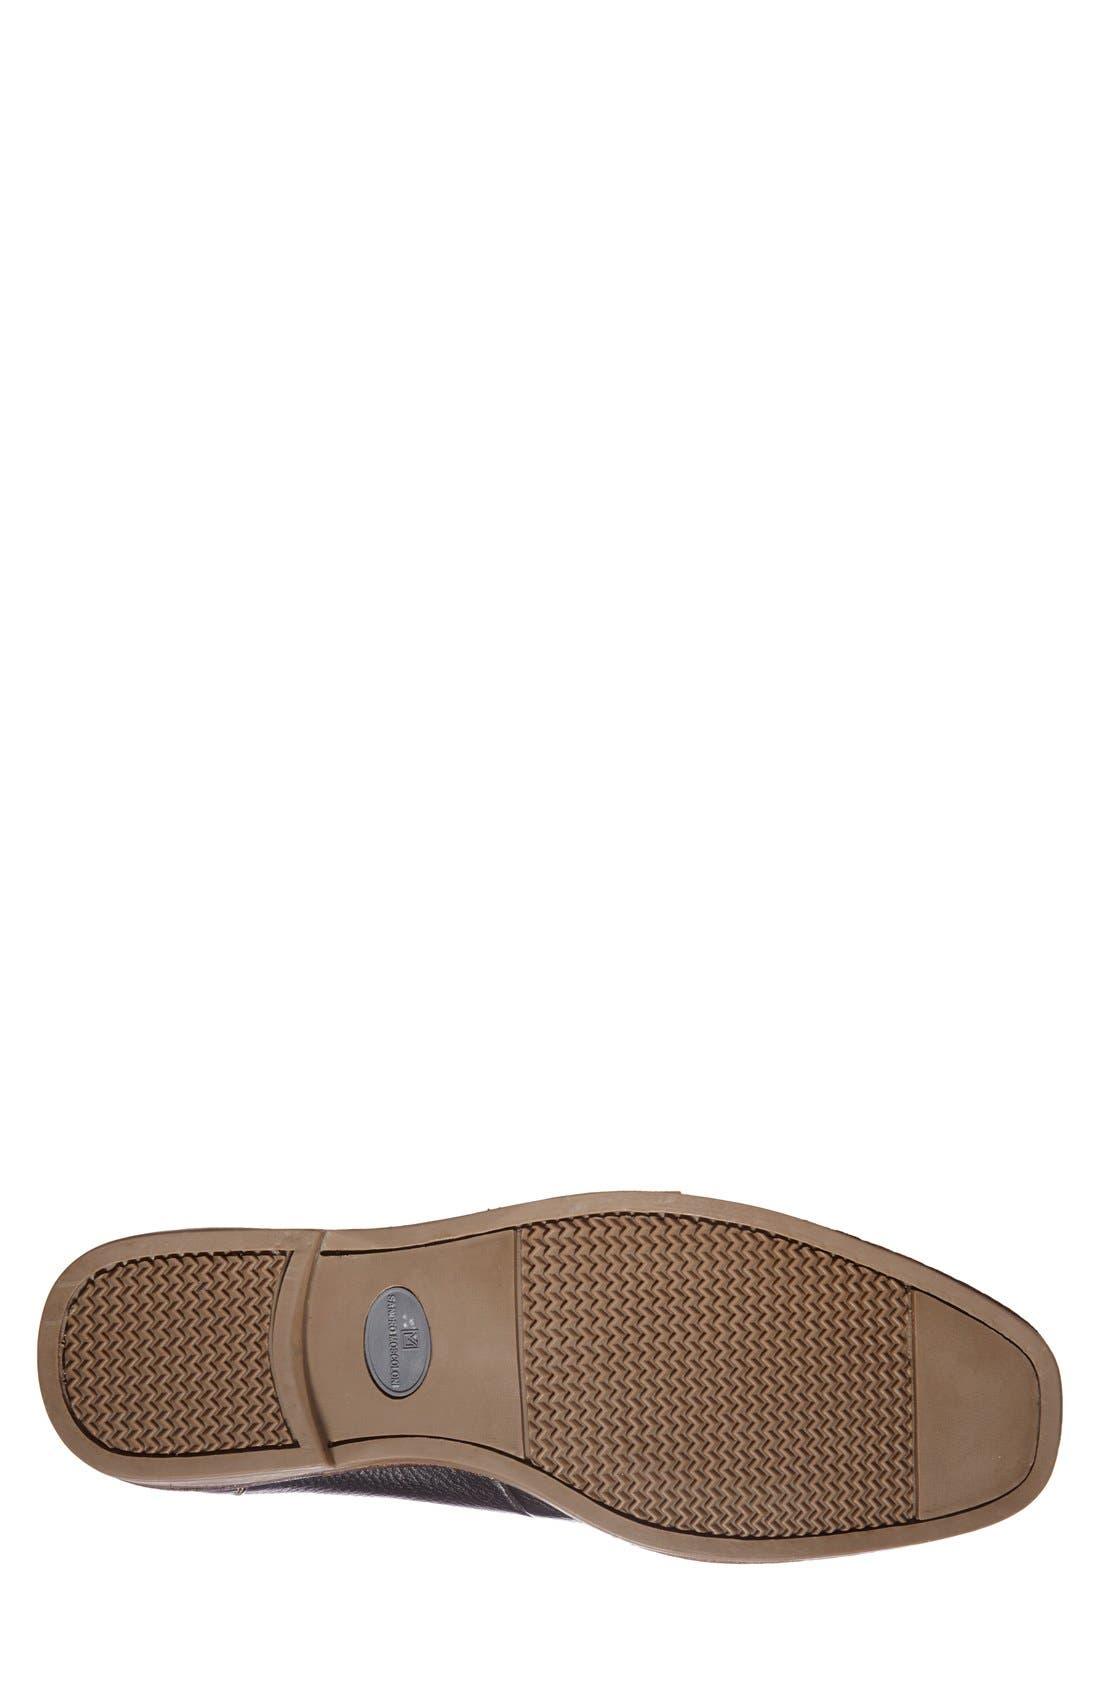 'Easy' Leather Venetian Loafer,                             Alternate thumbnail 4, color,                             NAVY